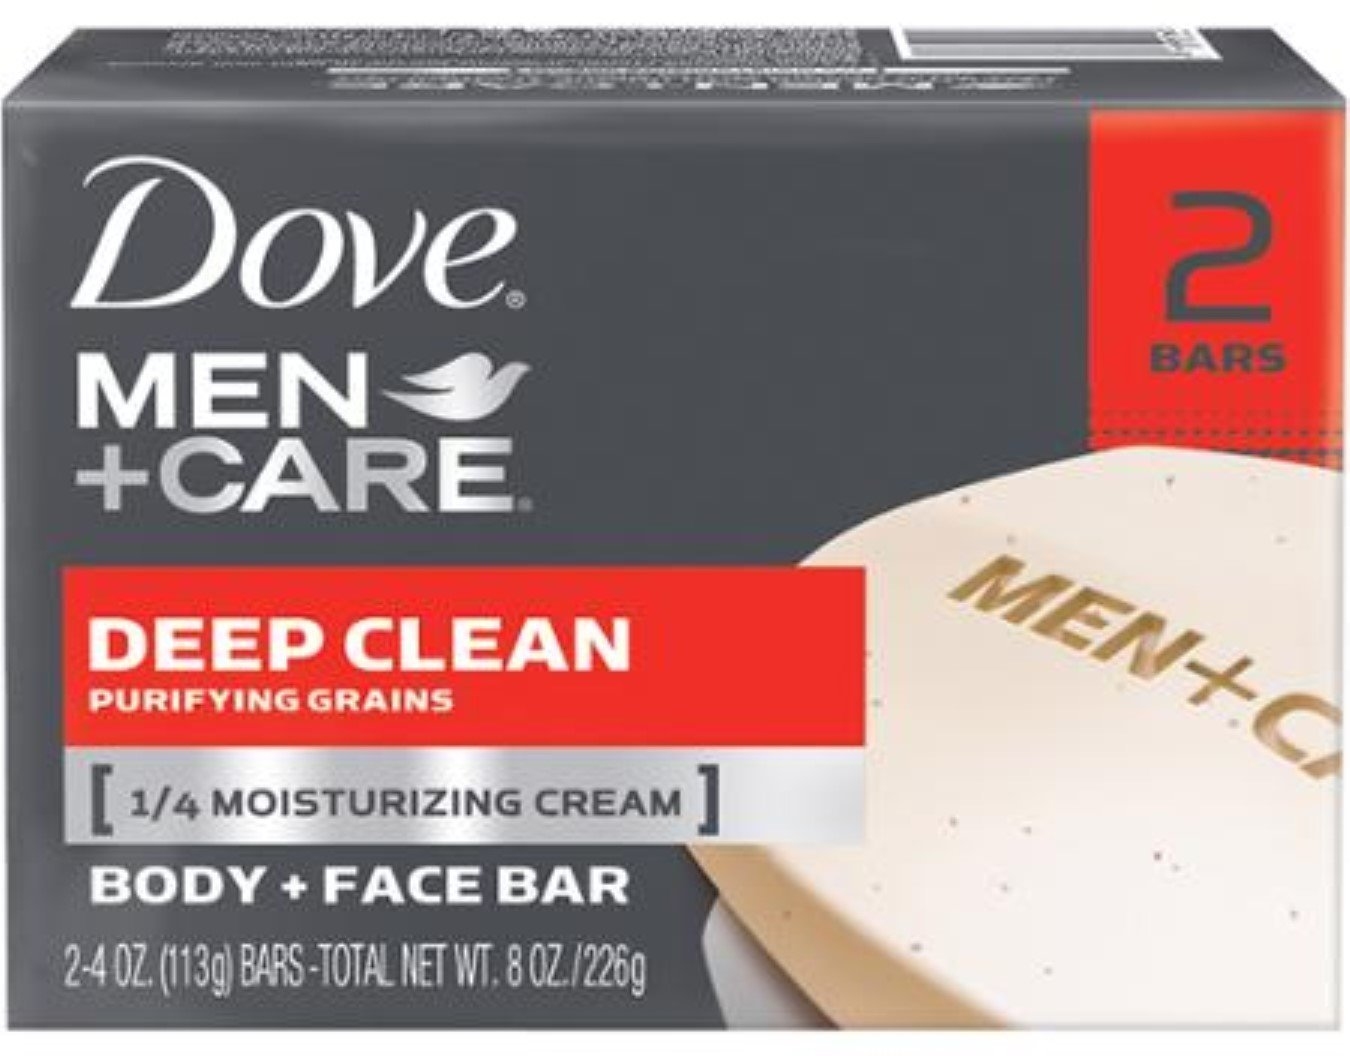 Dove Men+Care Body & Face Bar, Deep Clean 4.25 oz bars, 2 ea (2 Pack)